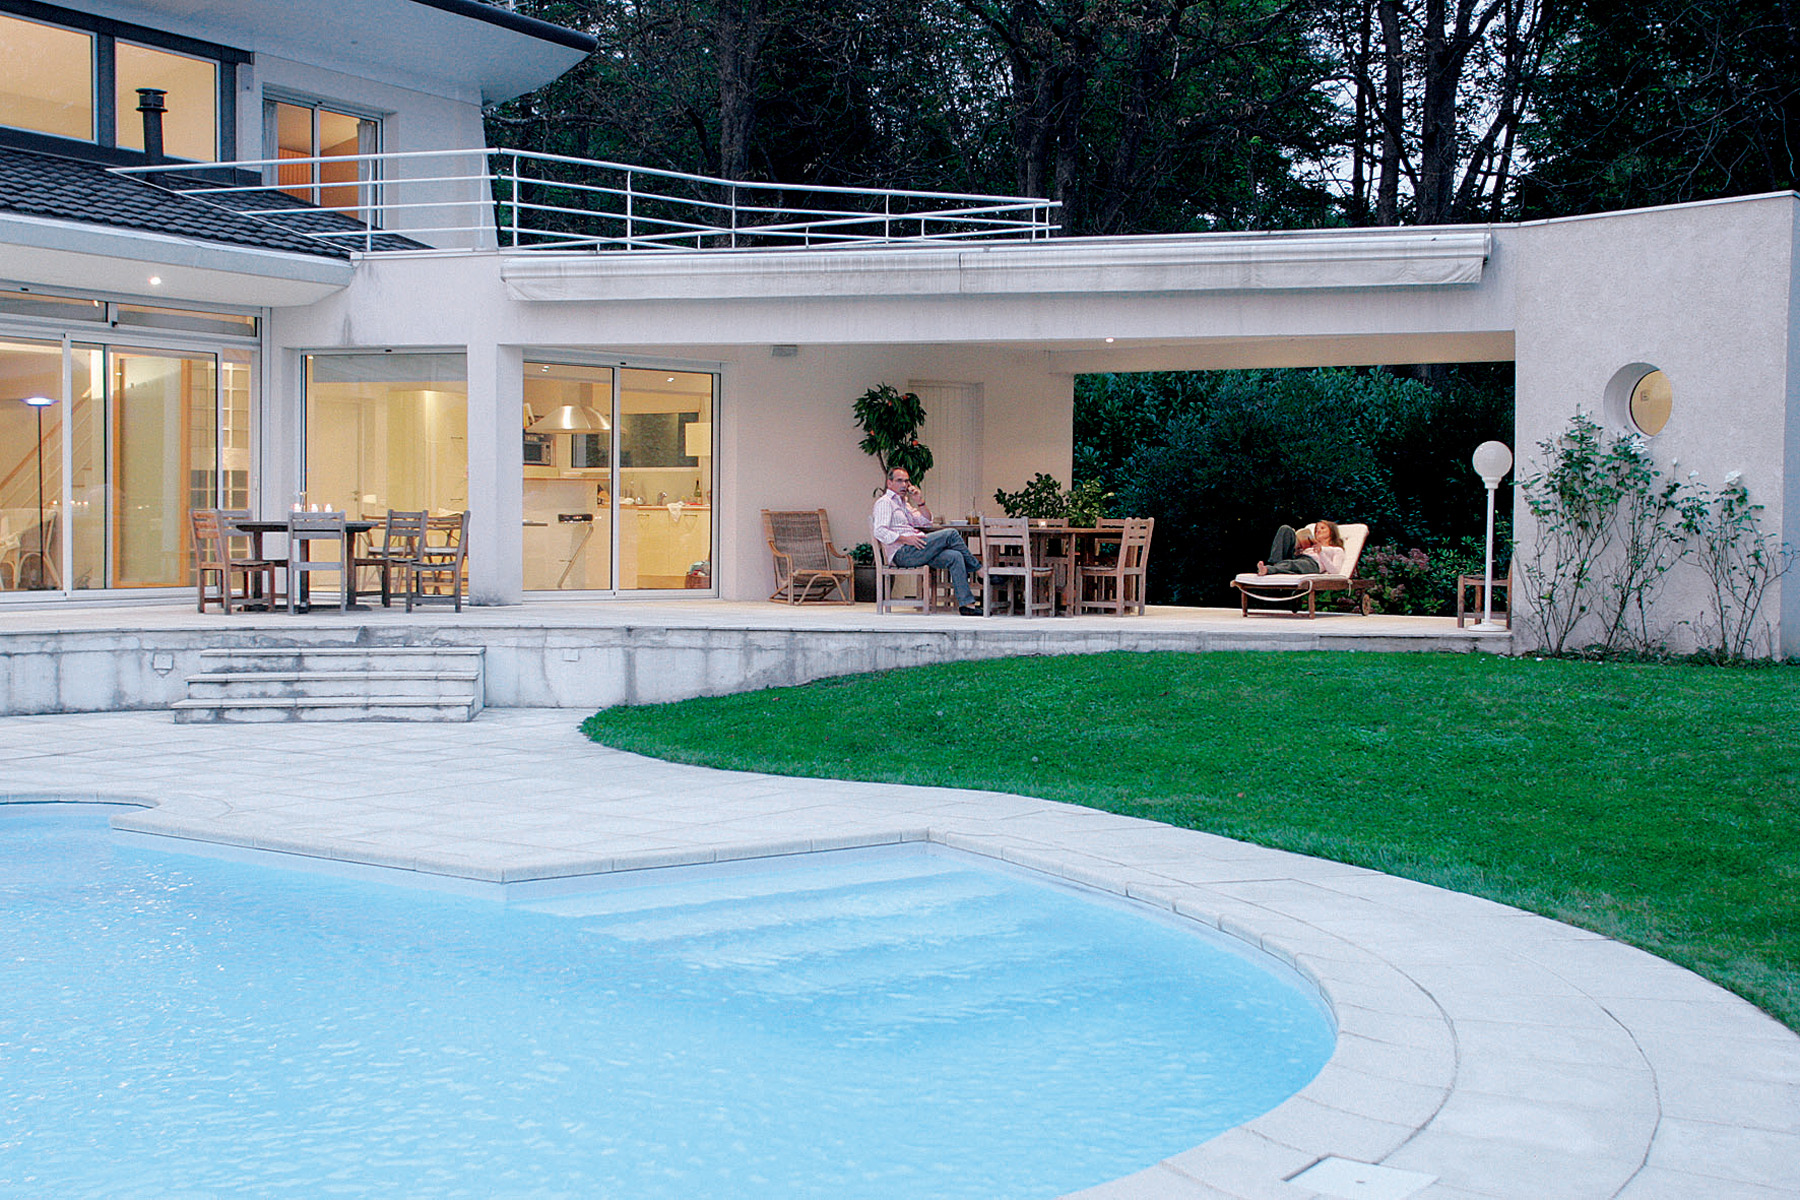 janik architecte maison individuelle meylan 1. Black Bedroom Furniture Sets. Home Design Ideas